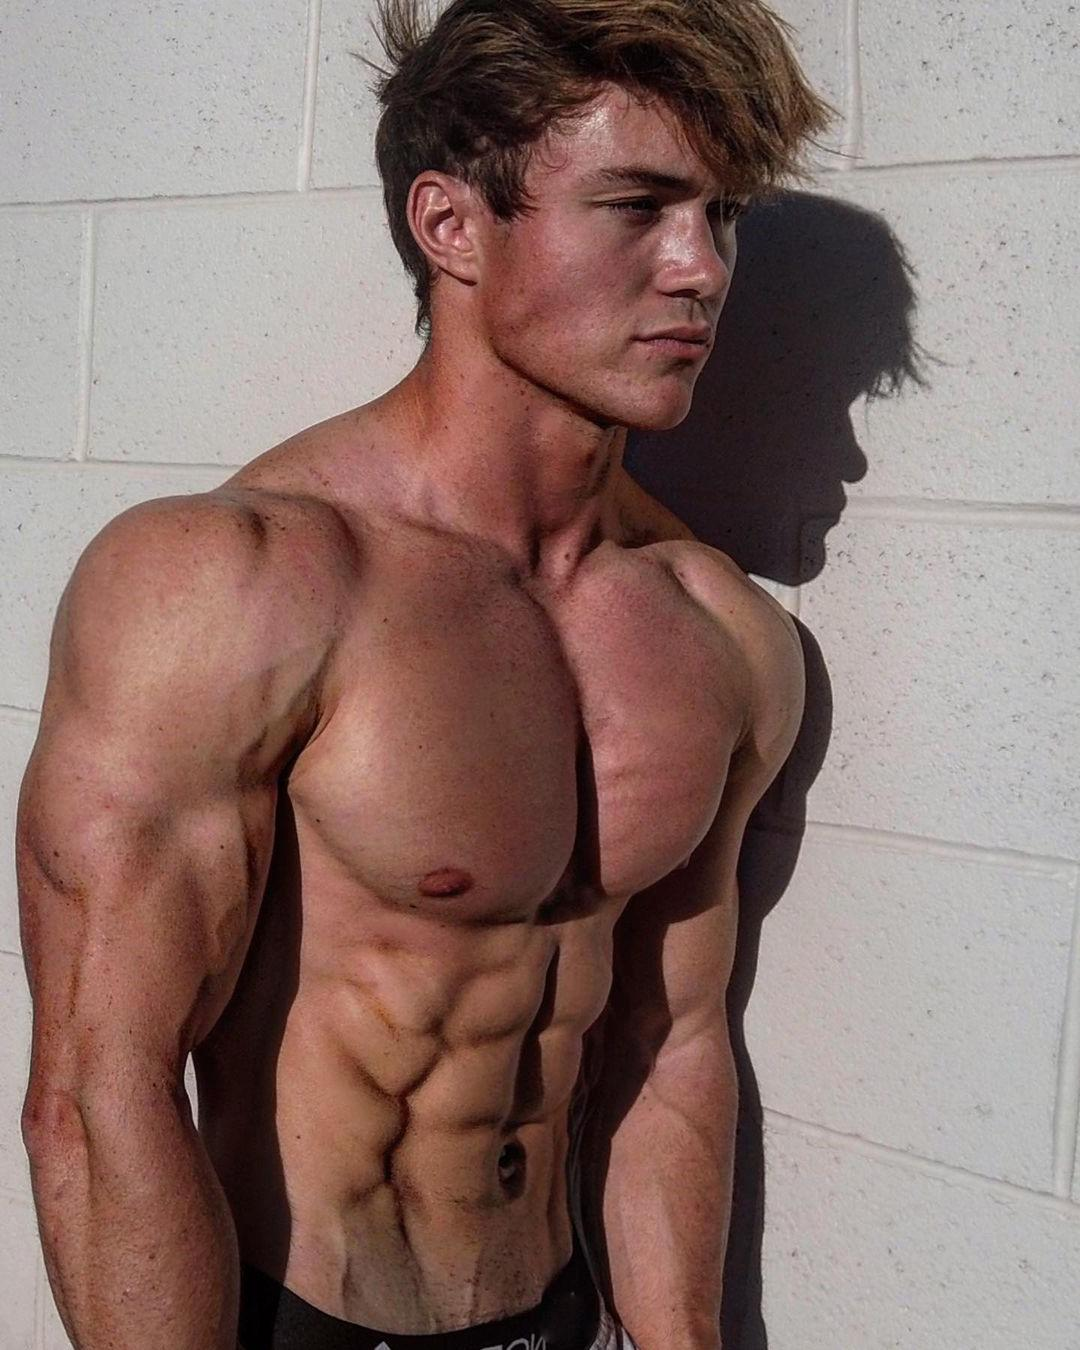 muscular-cute-boys-jason-bjarnson-strong-shirtless-fit-male-body